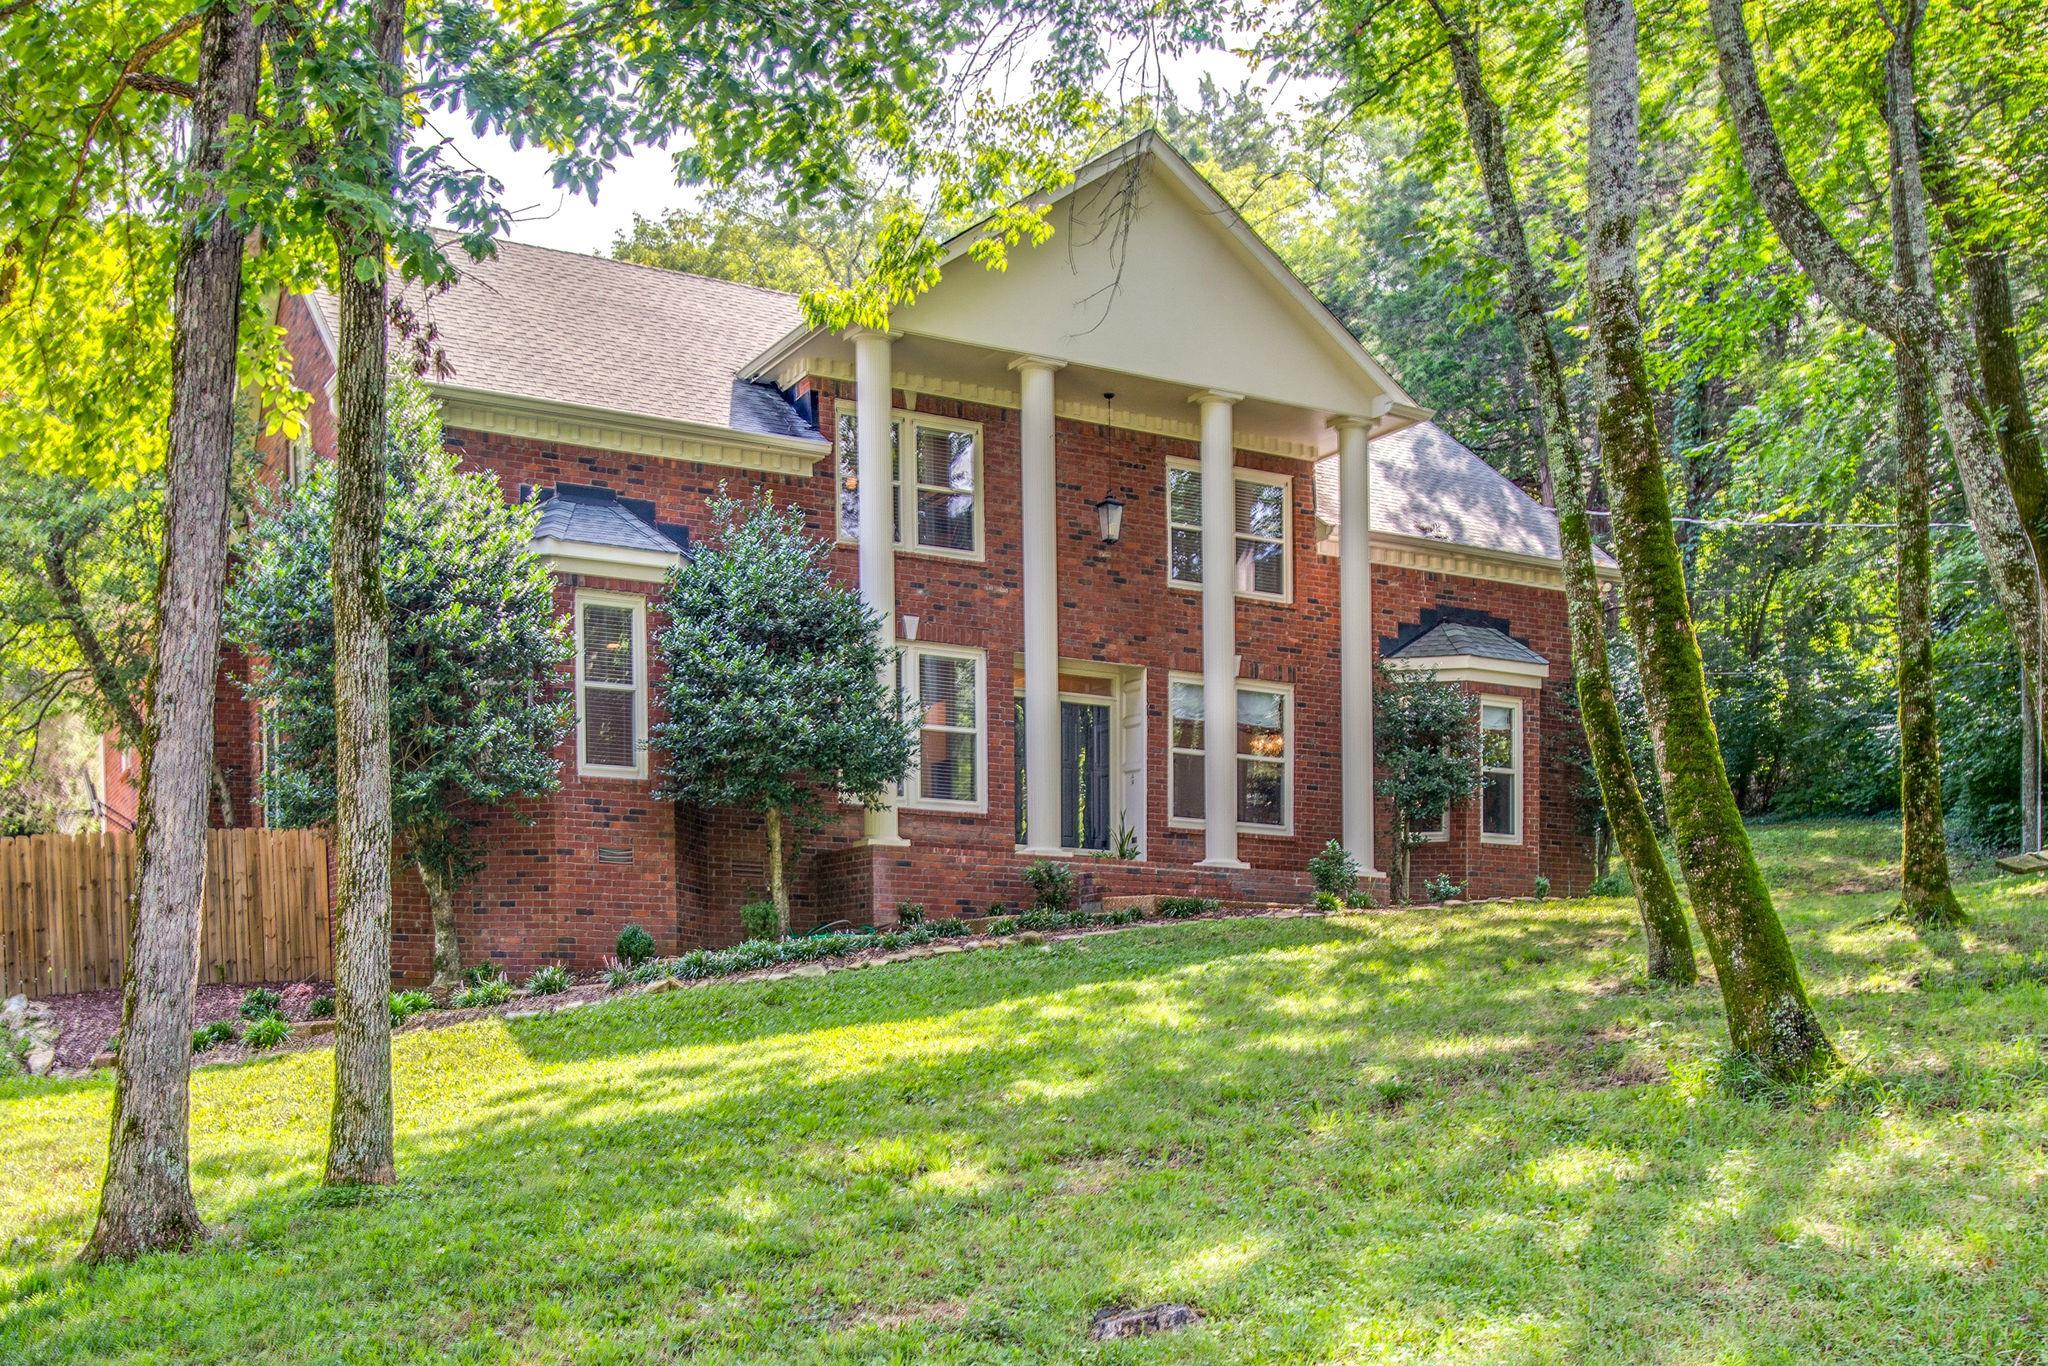 356 Sandcastle Rd, Franklin, TN 37069 - Franklin, TN real estate listing